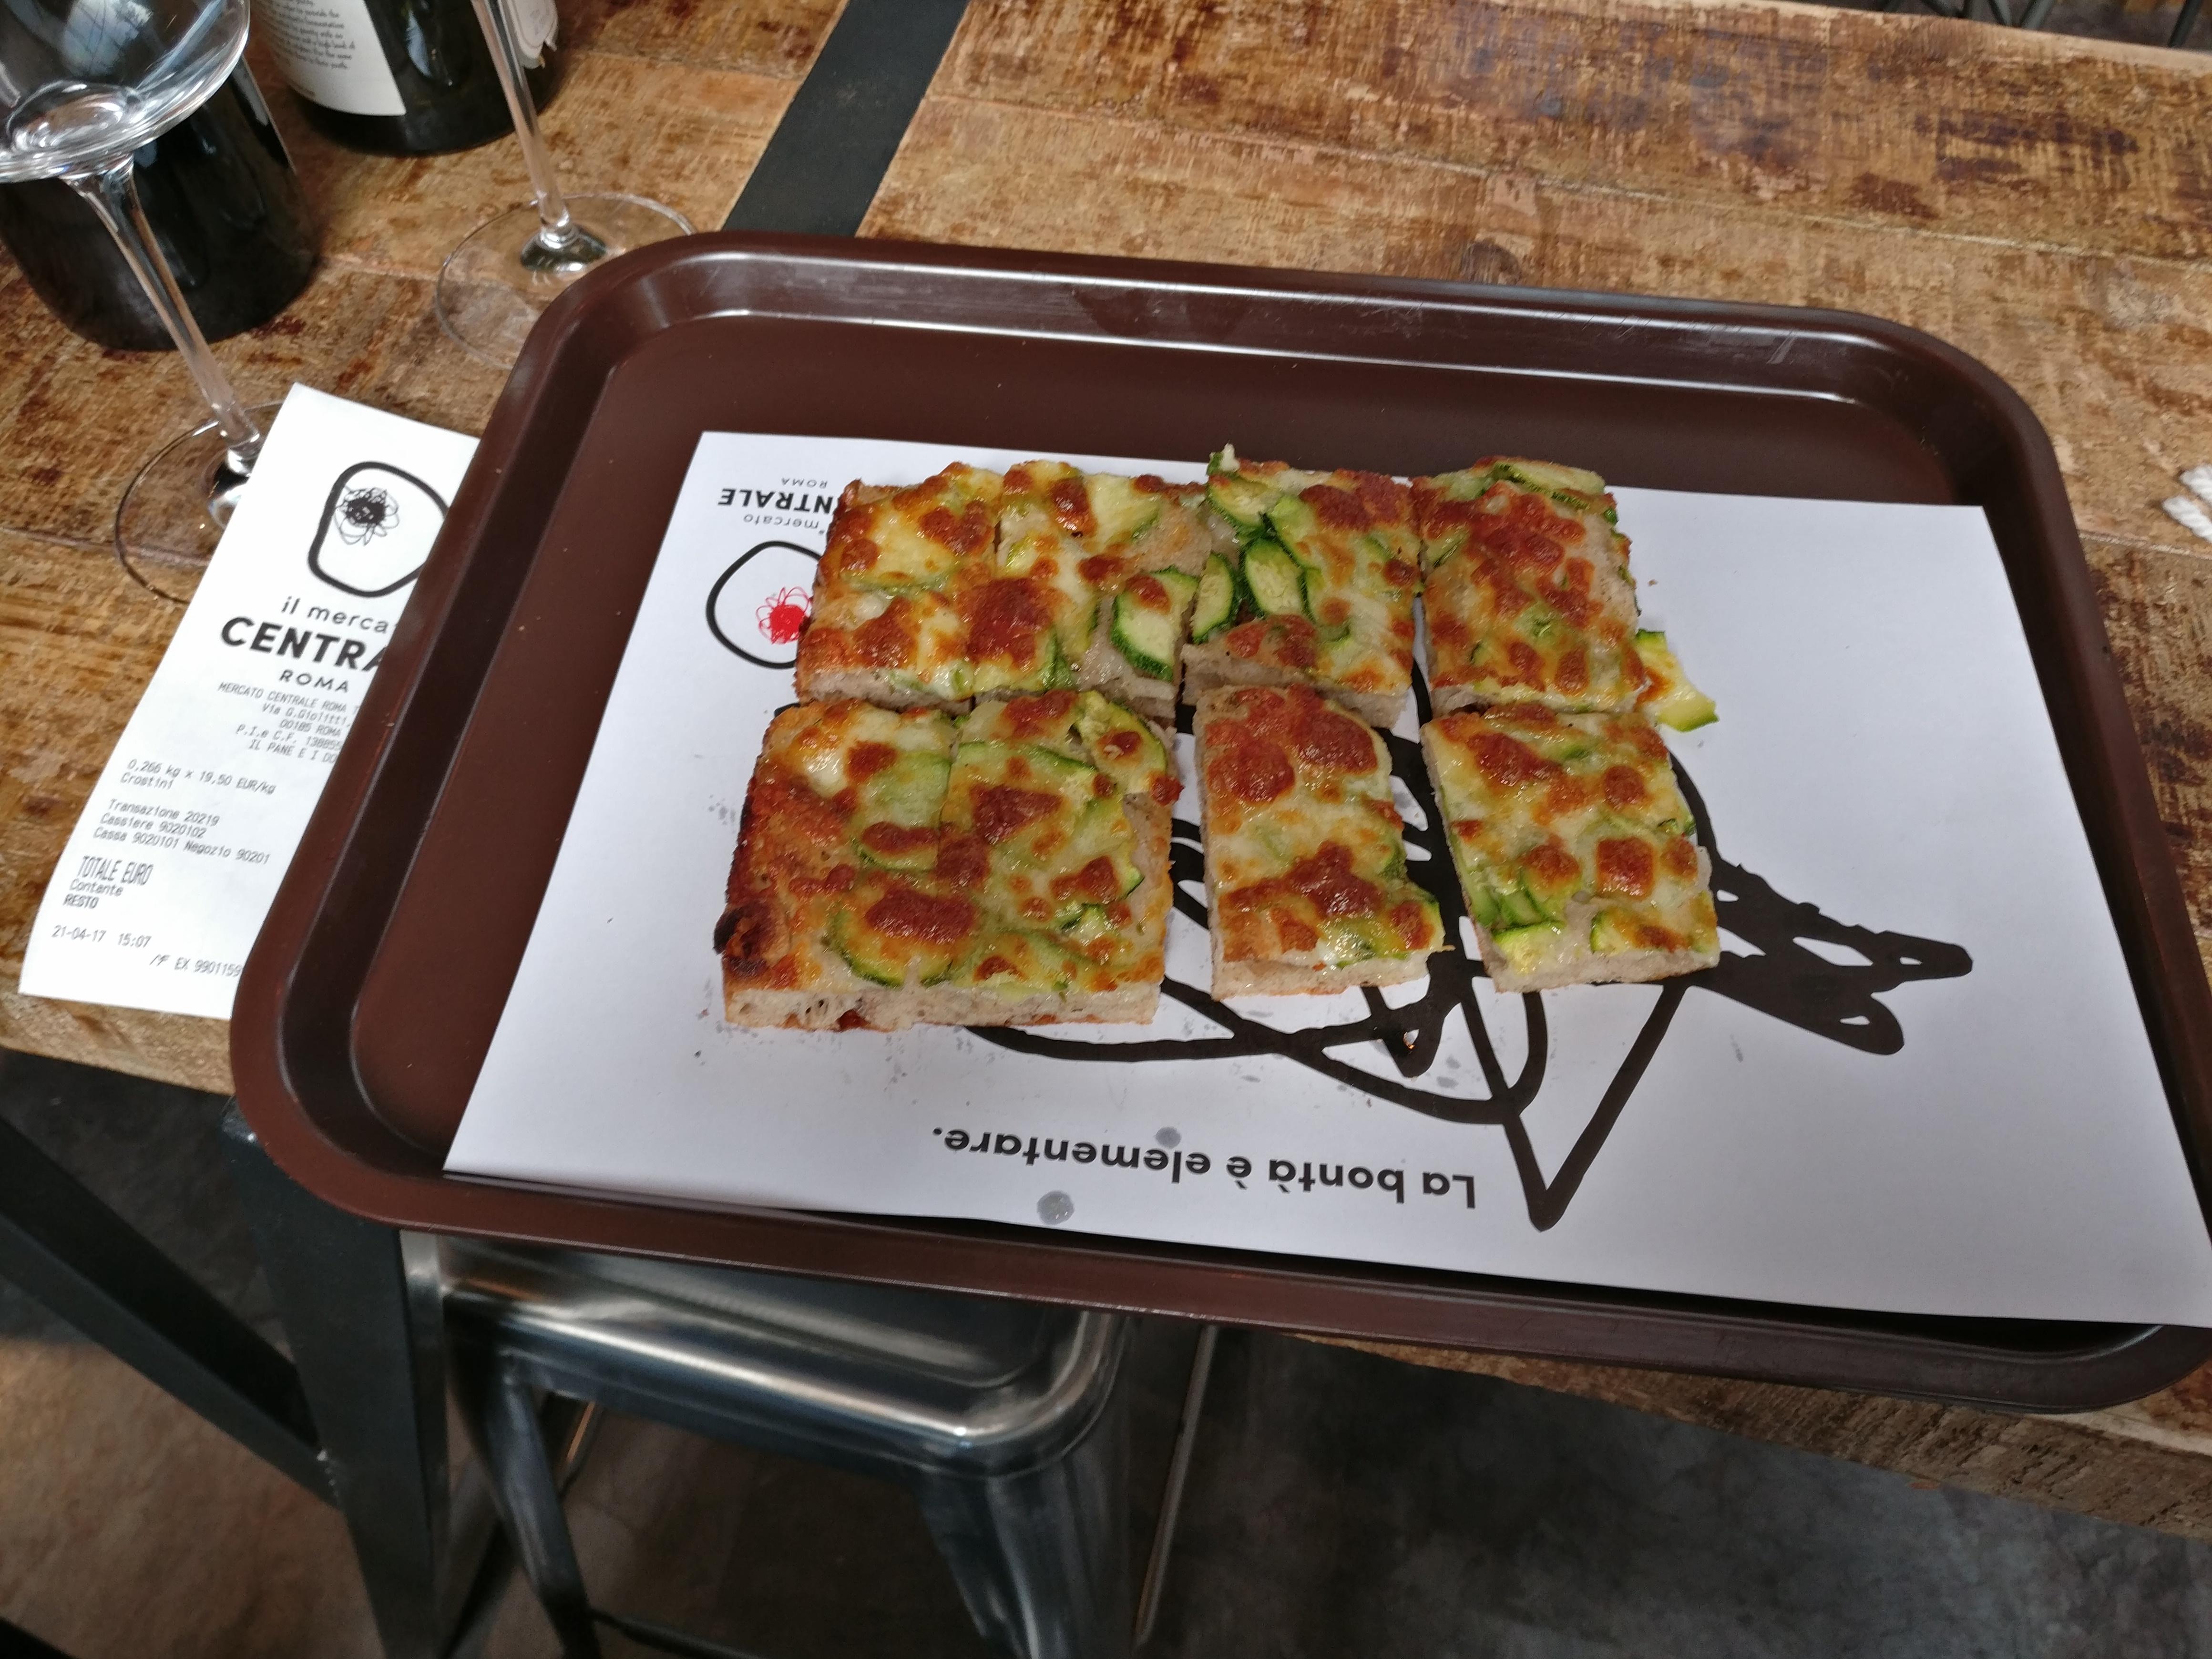 http://foodloader.net/nico_2017-04-21_crostini-pizza-zucchini.jpg